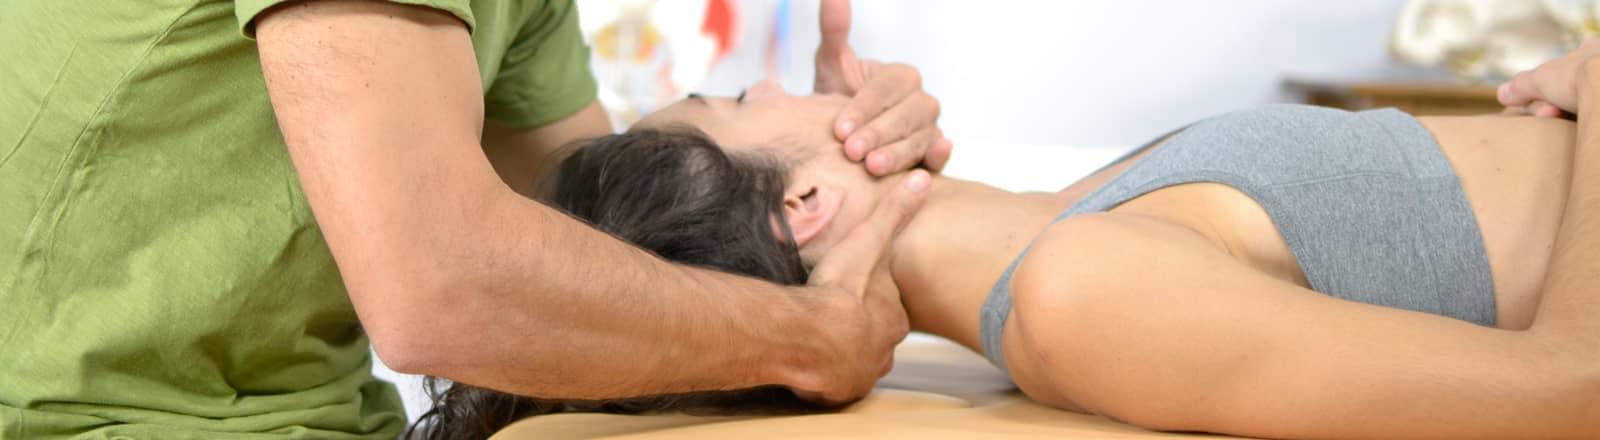 ejercicio terapeutico Logroño